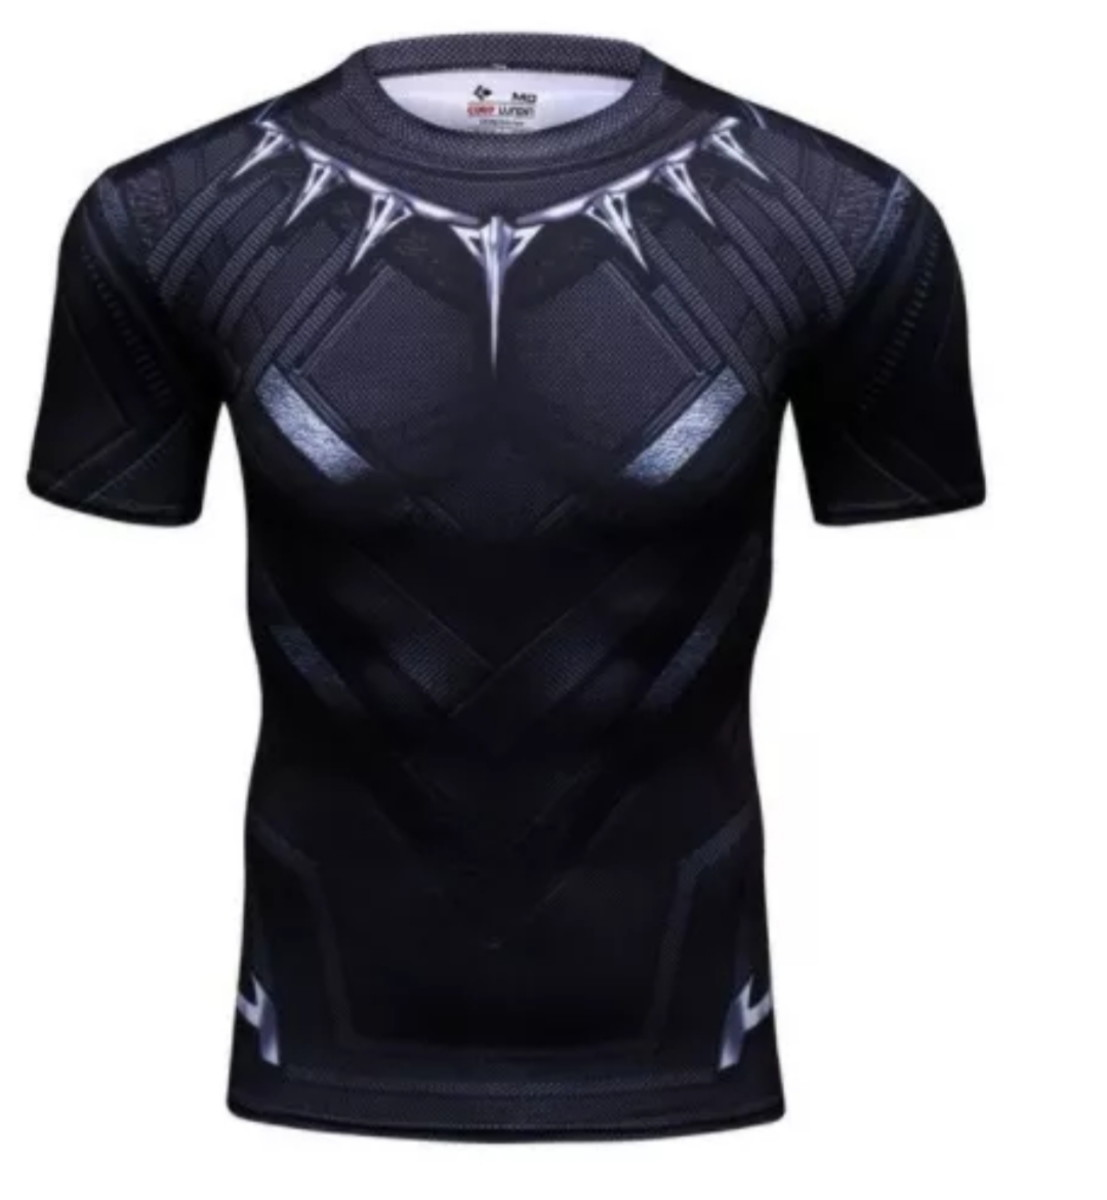 Camisa De Compressão Pantera Negra - Marvel Cosplay Casual no Elo7 ... fa573aeec3ea2